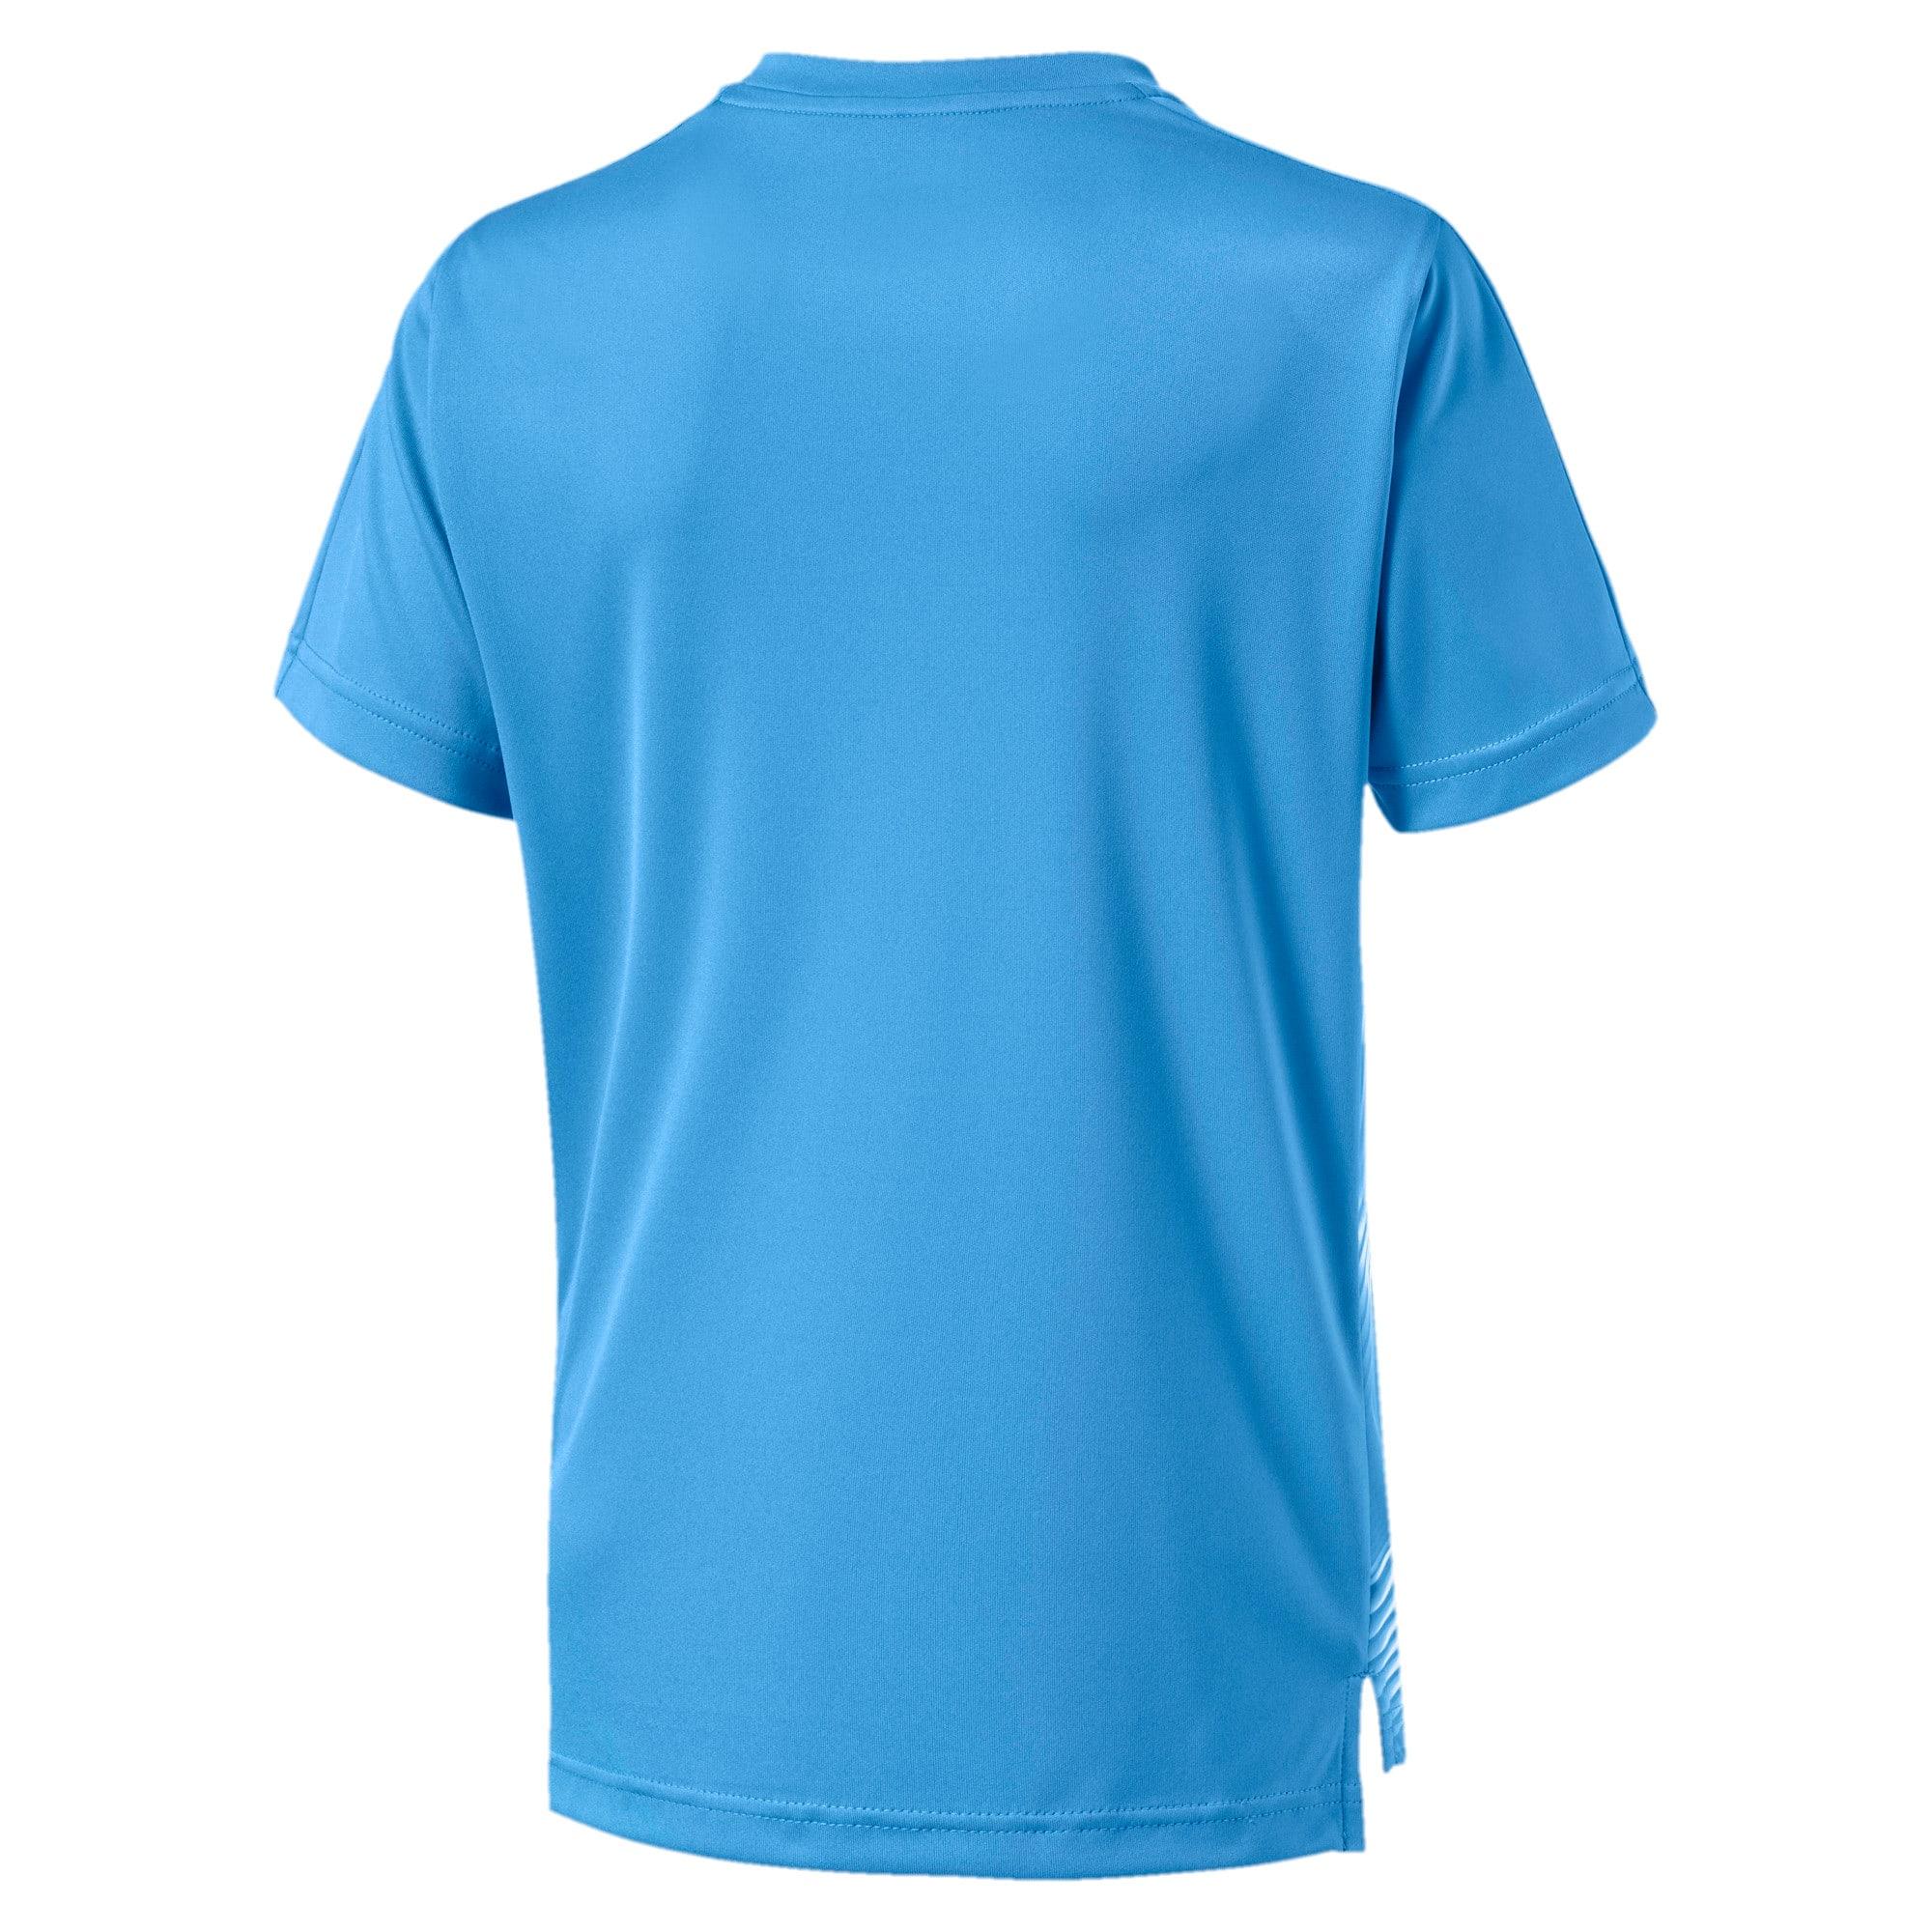 Thumbnail 2 of Olympique de Marseille Stadium Boys' Jersey, Bleu Azur-Puma White, medium